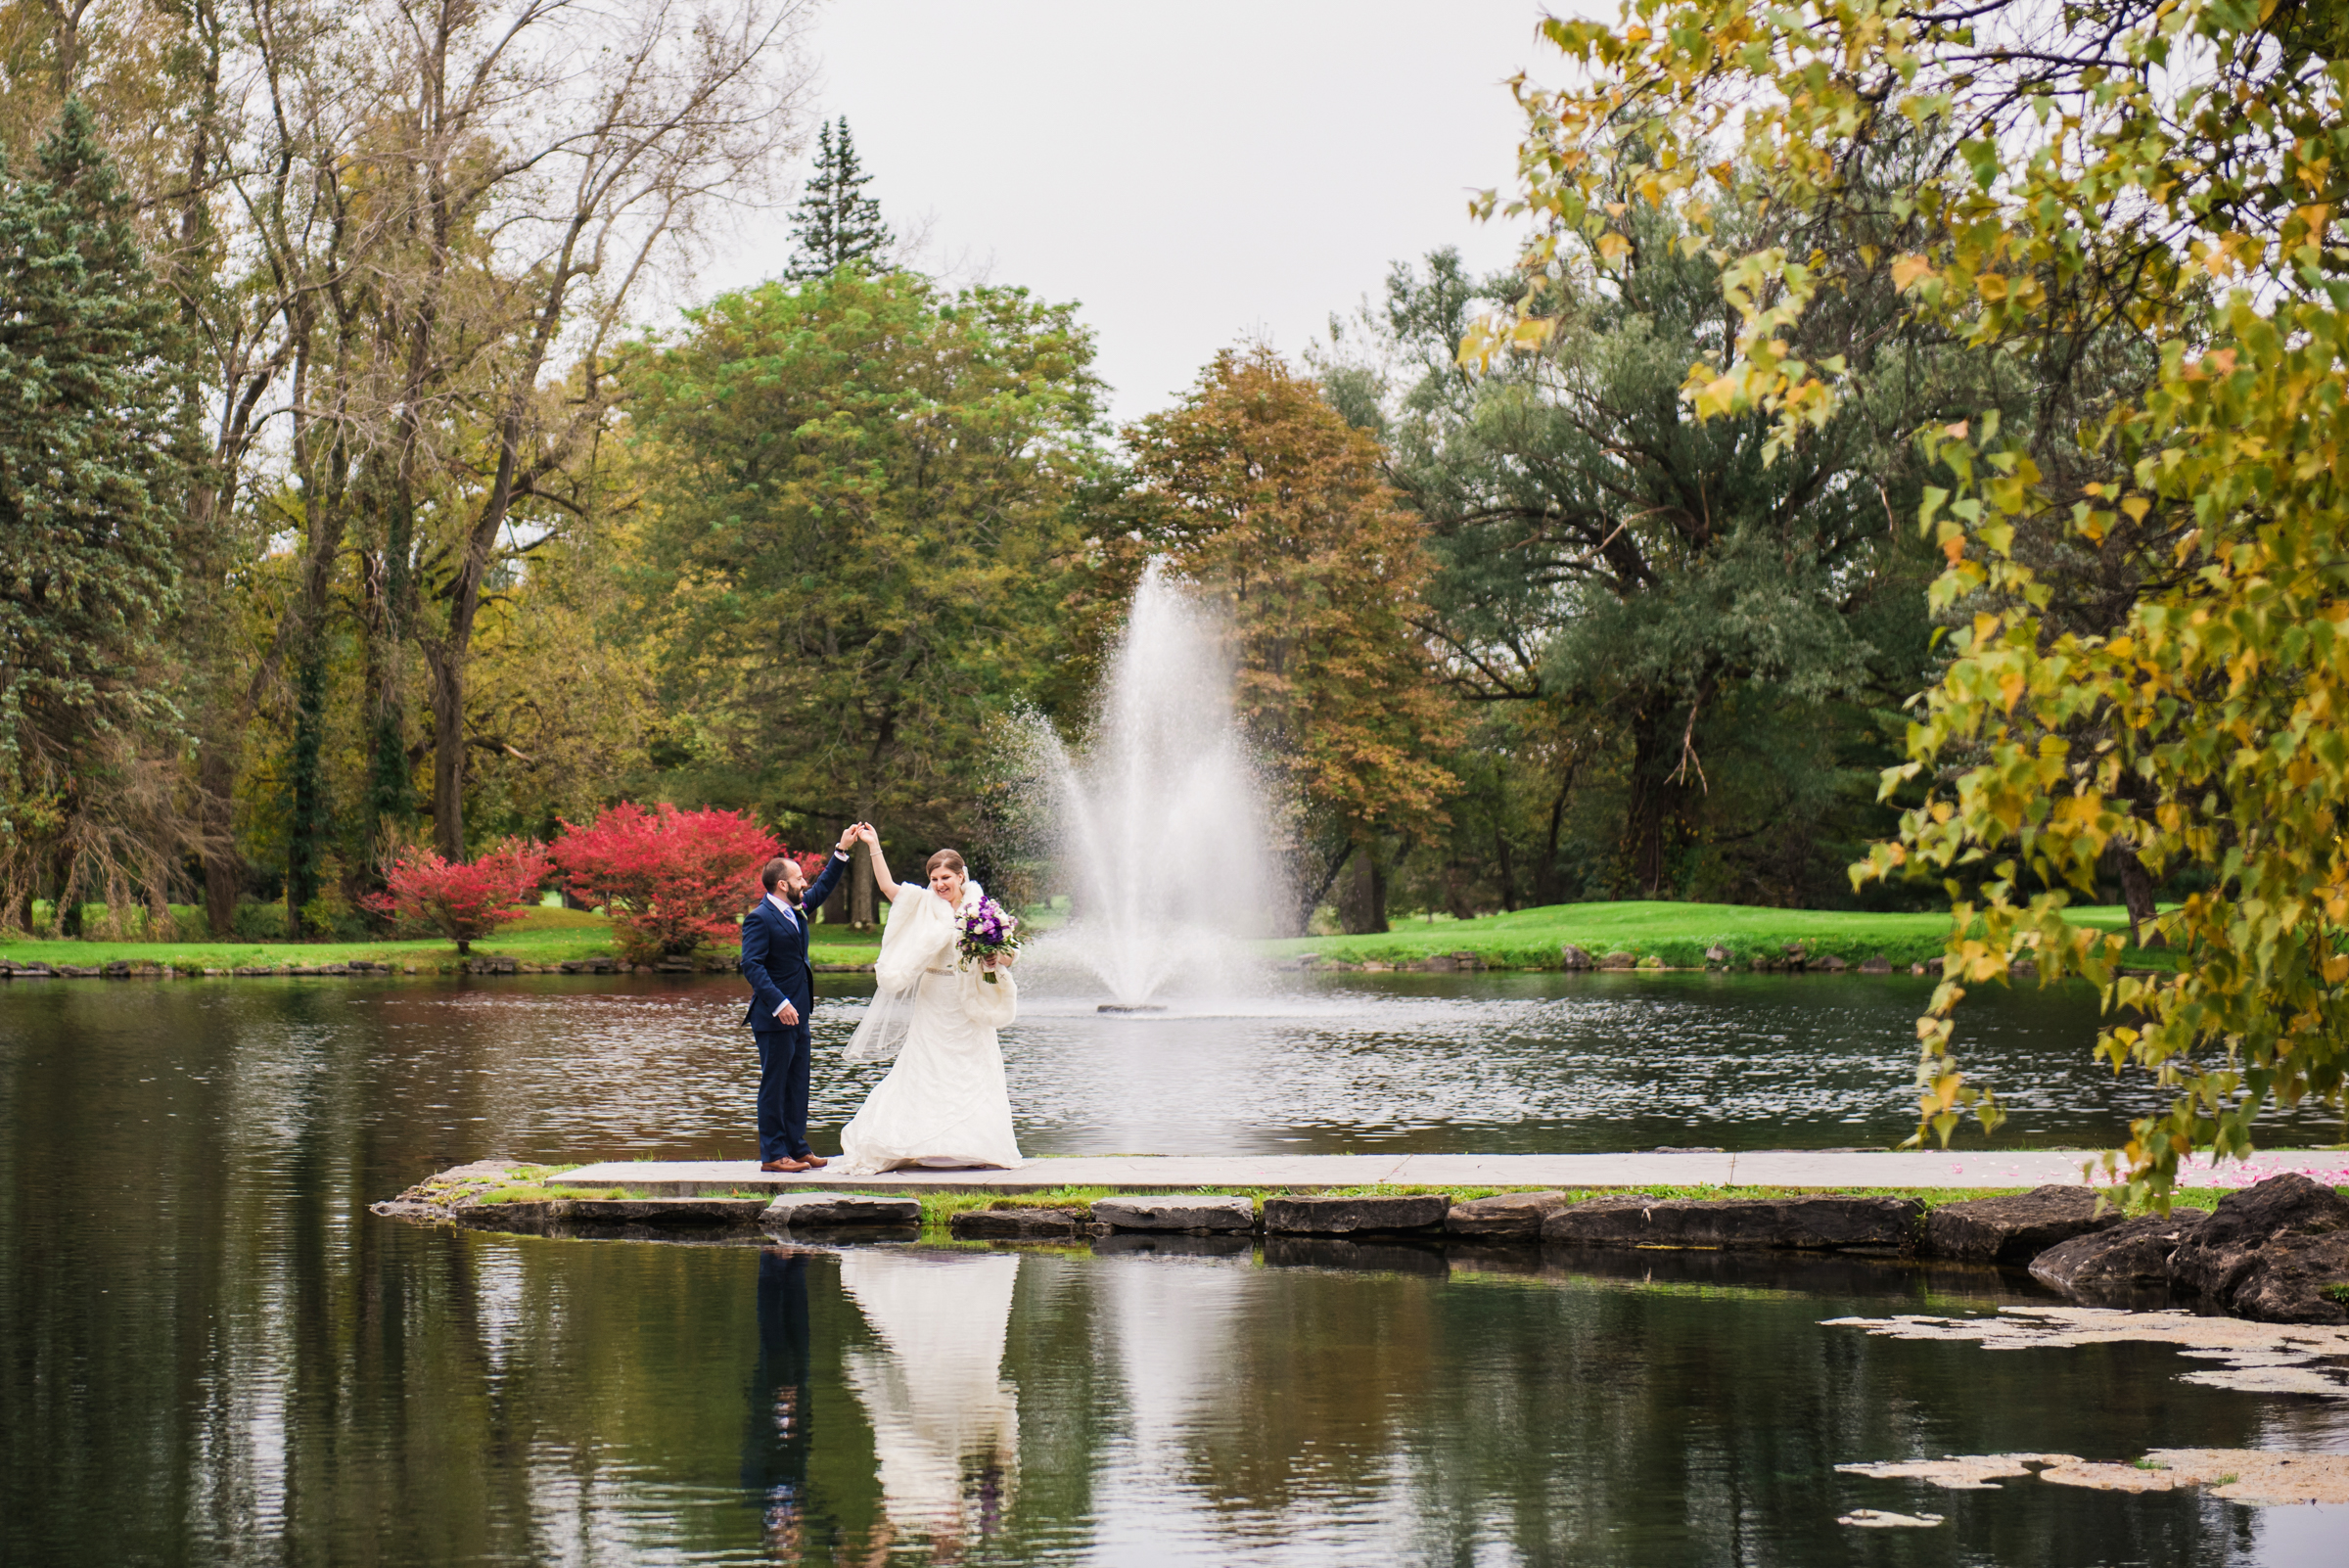 Shadow_Lake_Rochester_Wedding_JILL_STUDIO_Rochester_NY_Photographer_DSC_6029.jpg